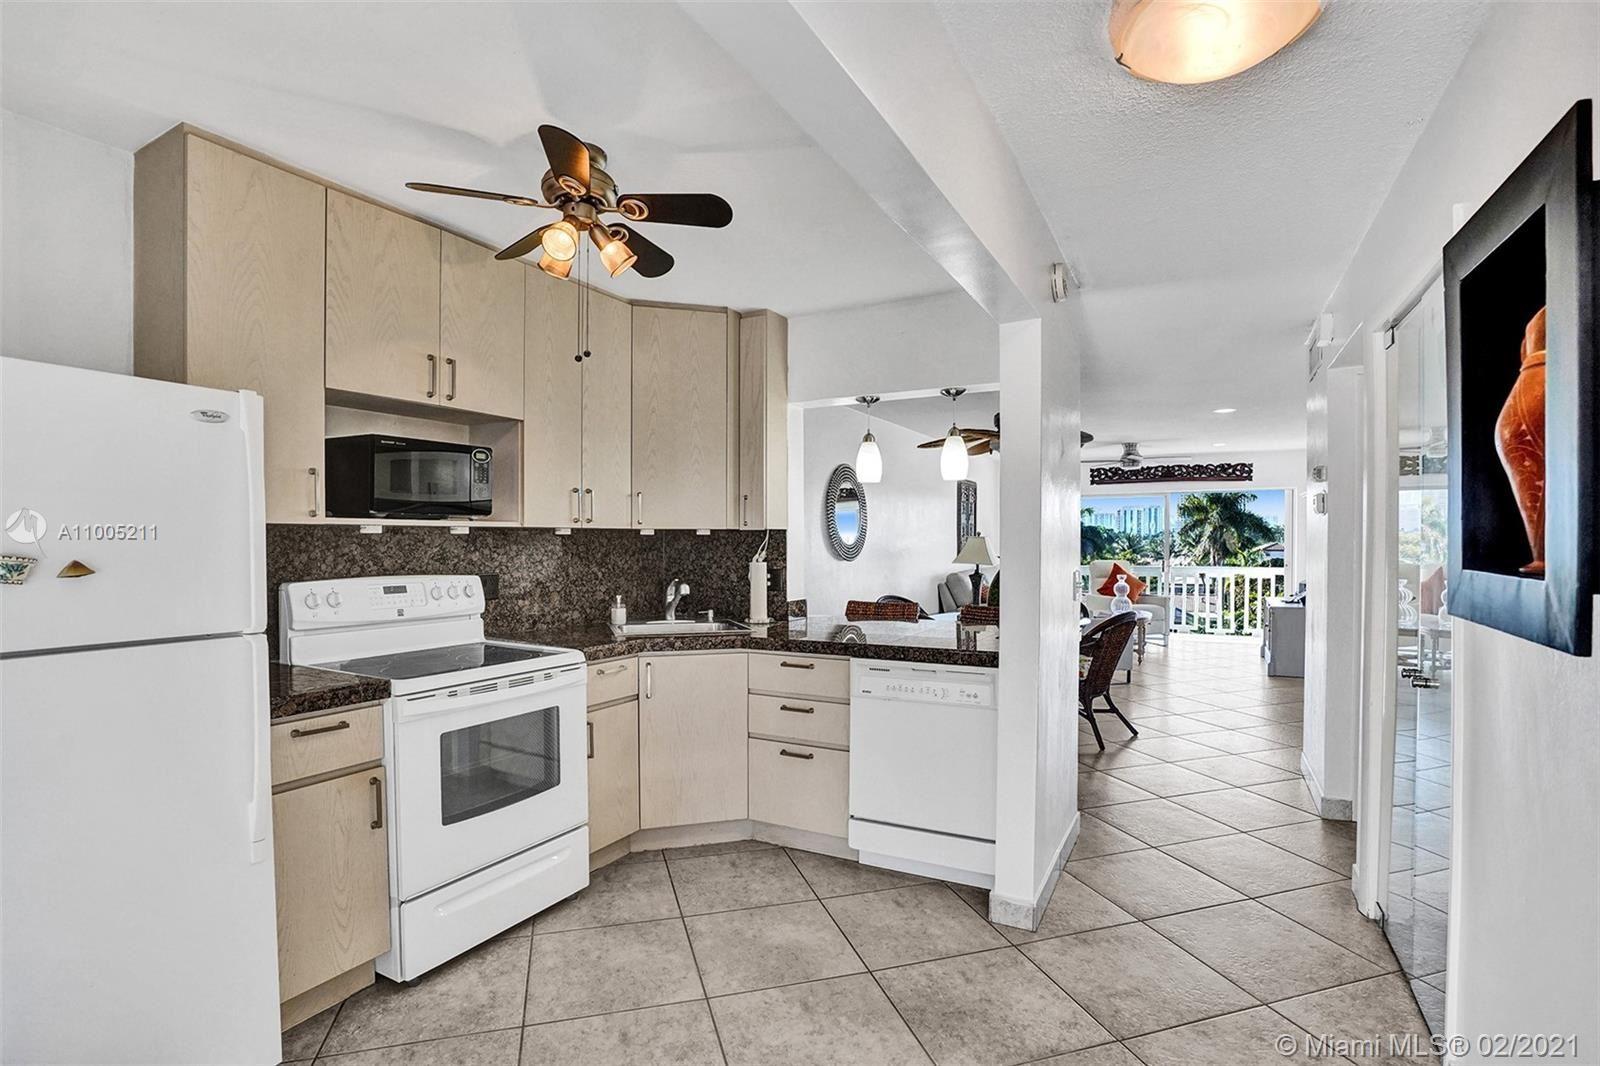 Photo of 455 Paradise Isle Blvd #409, Hallandale Beach, FL 33009 (MLS # A11005211)